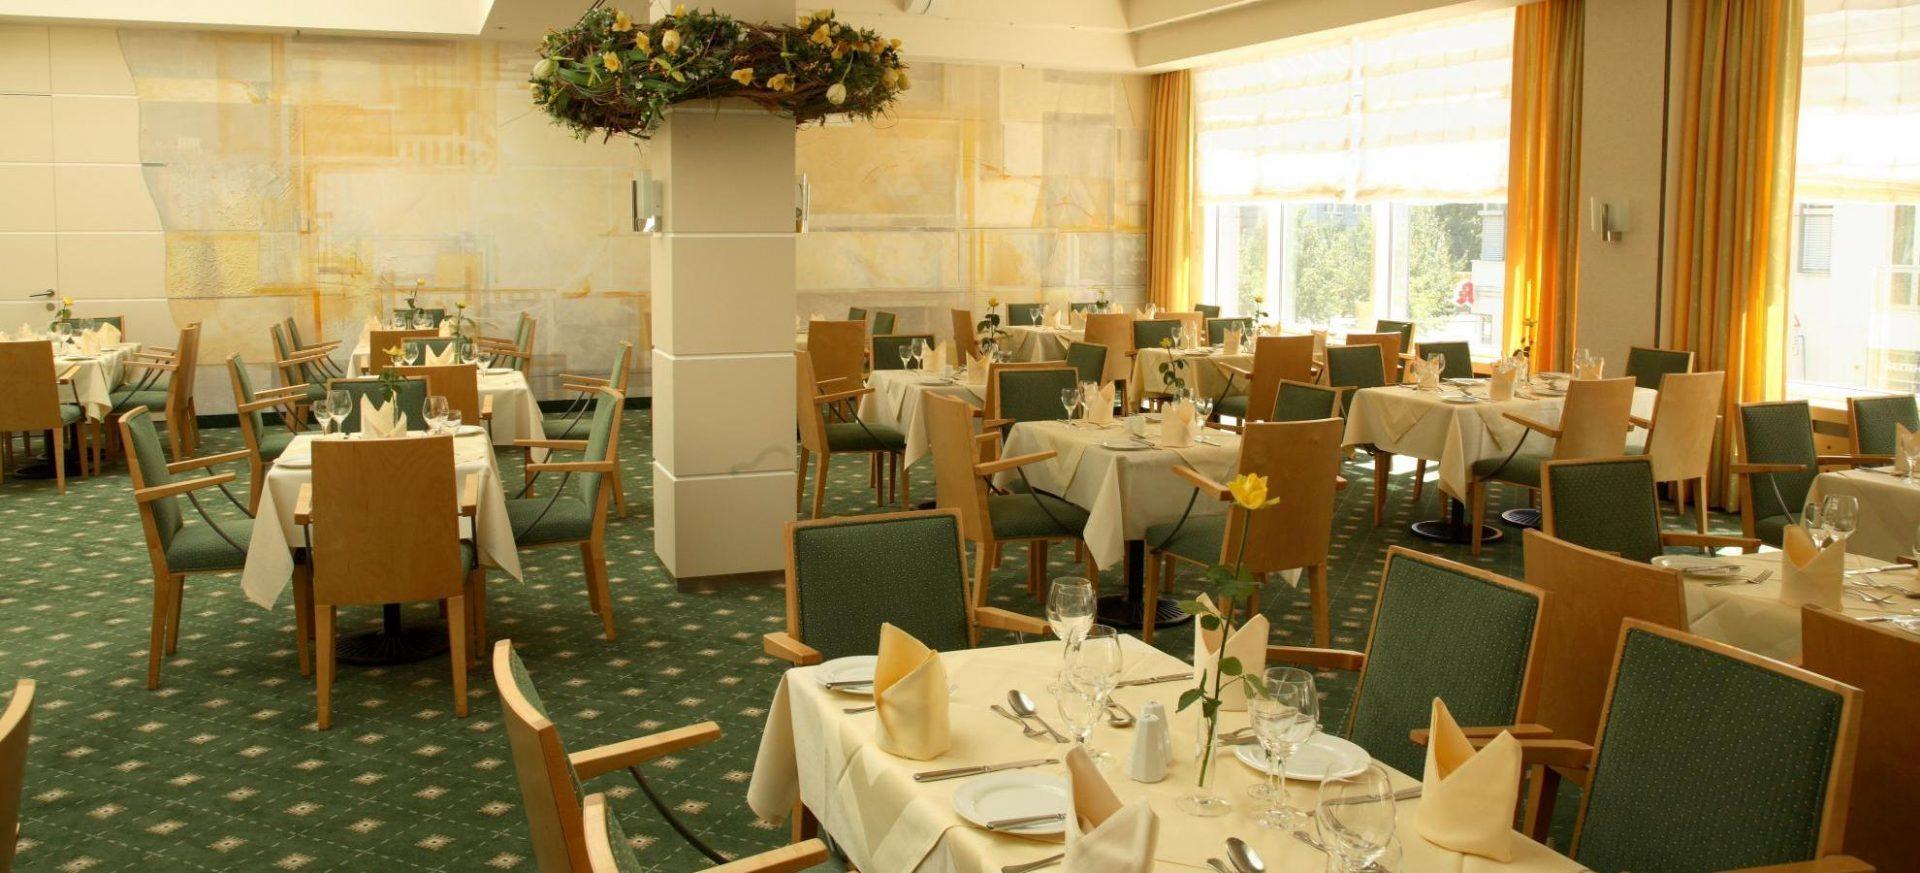 Radisson Blu Hotel Erfurt Restaurant